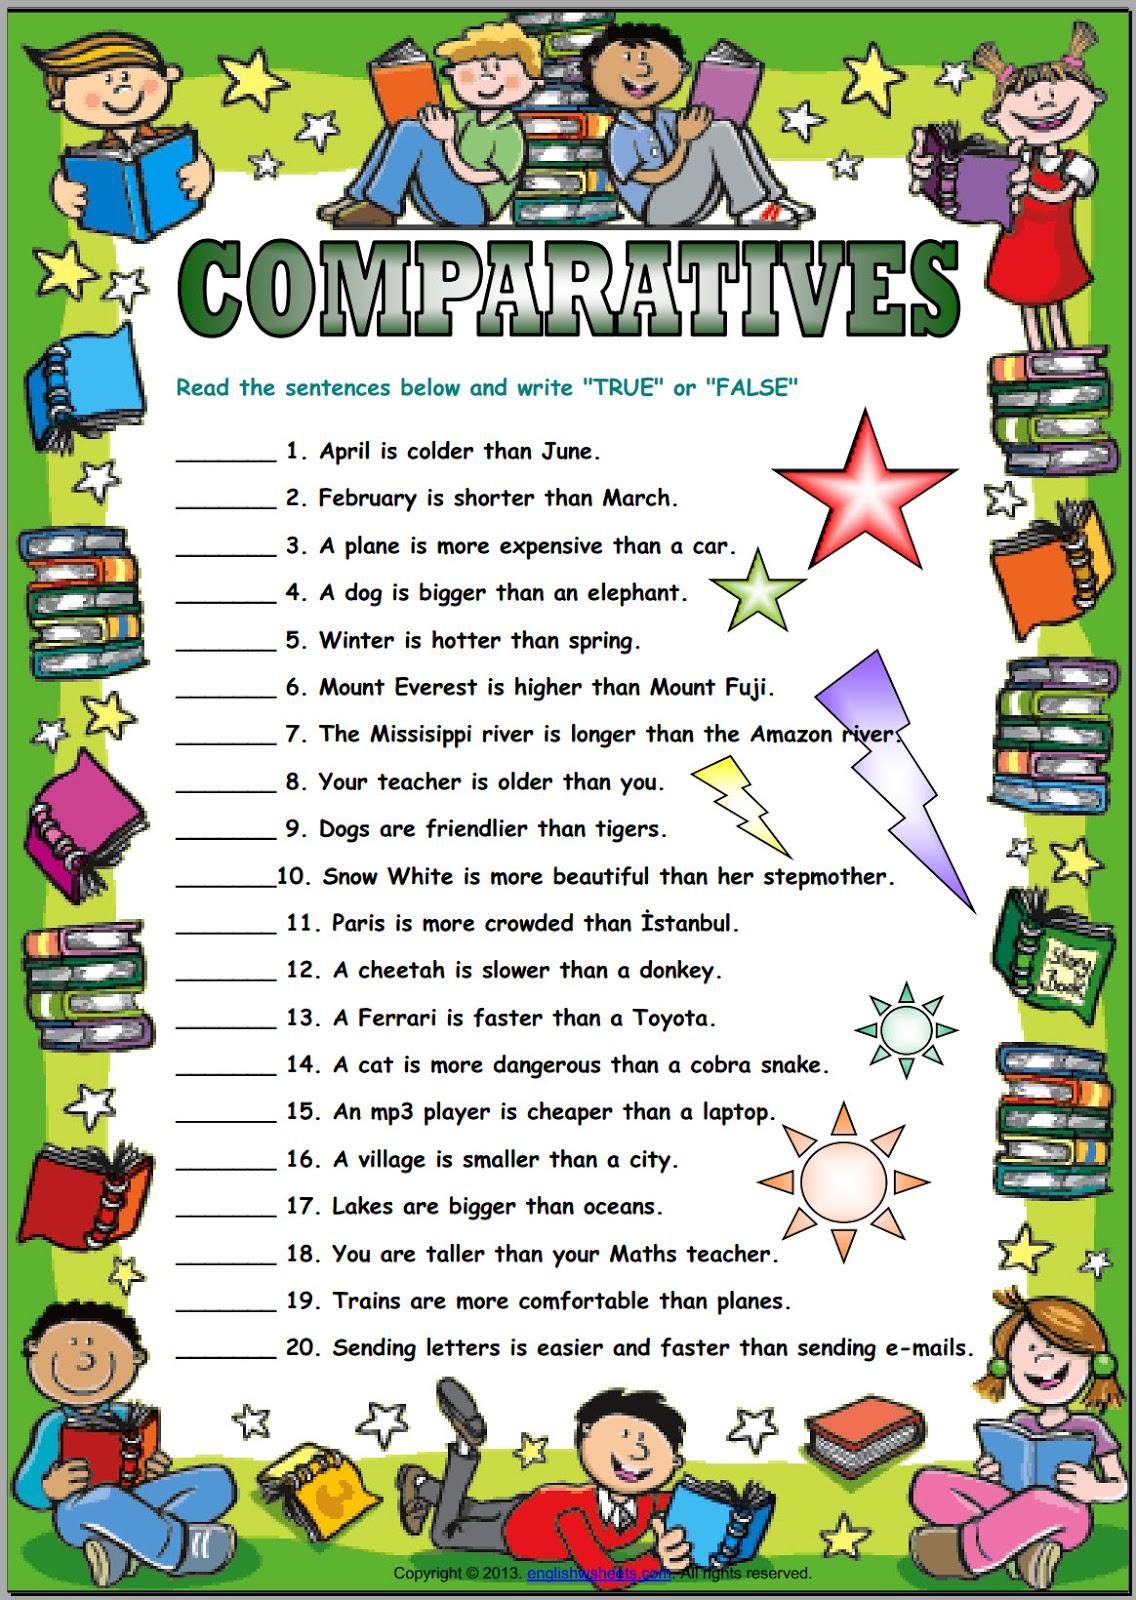 Home School Comparatives 2